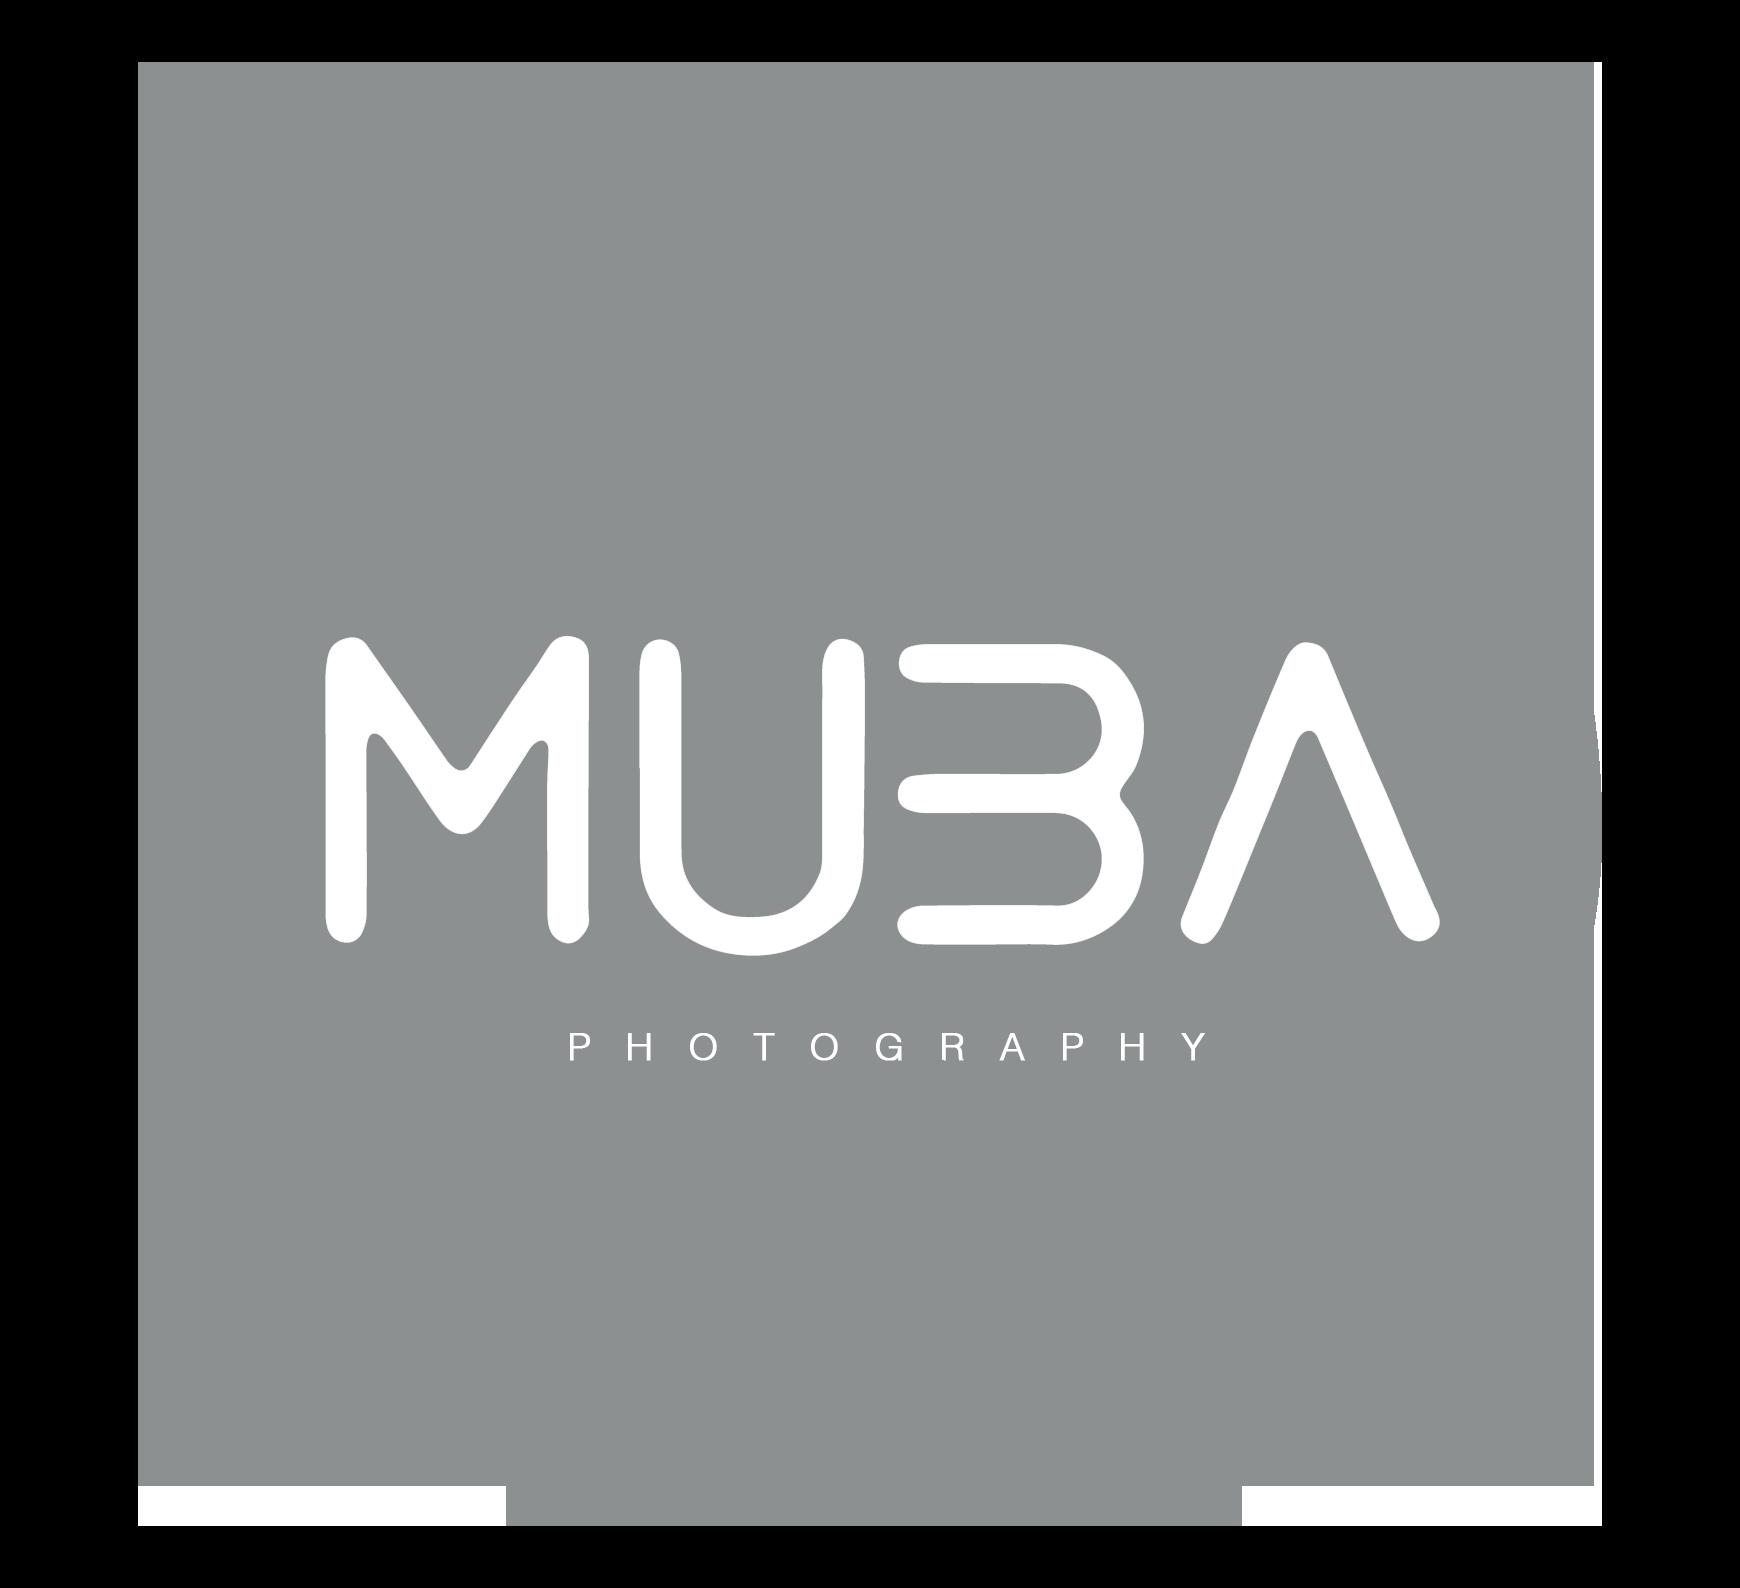 MUBA-Photography.PNG